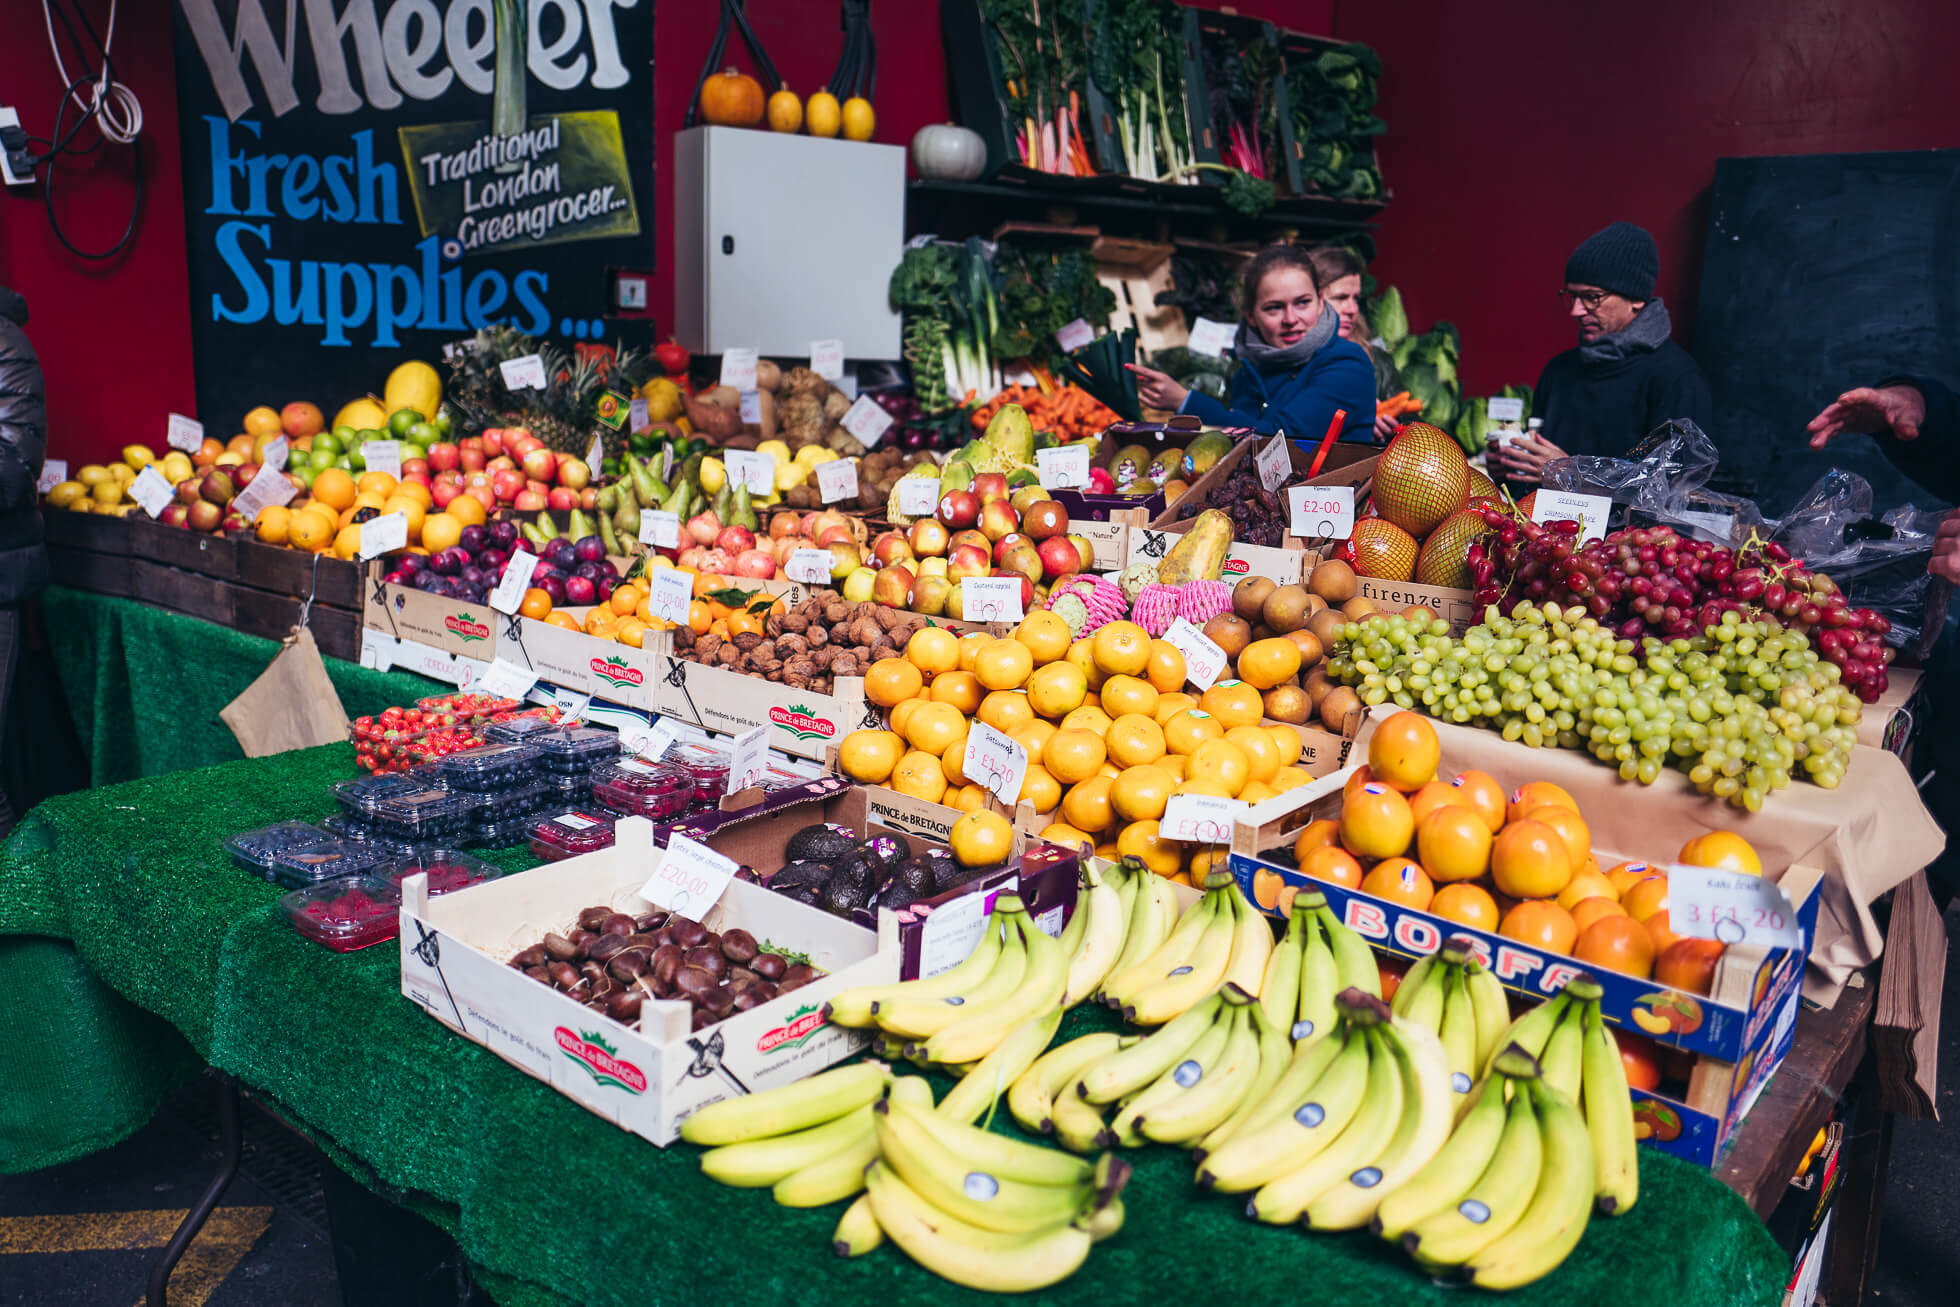 janni-deler-bourough-market-londonl1160276